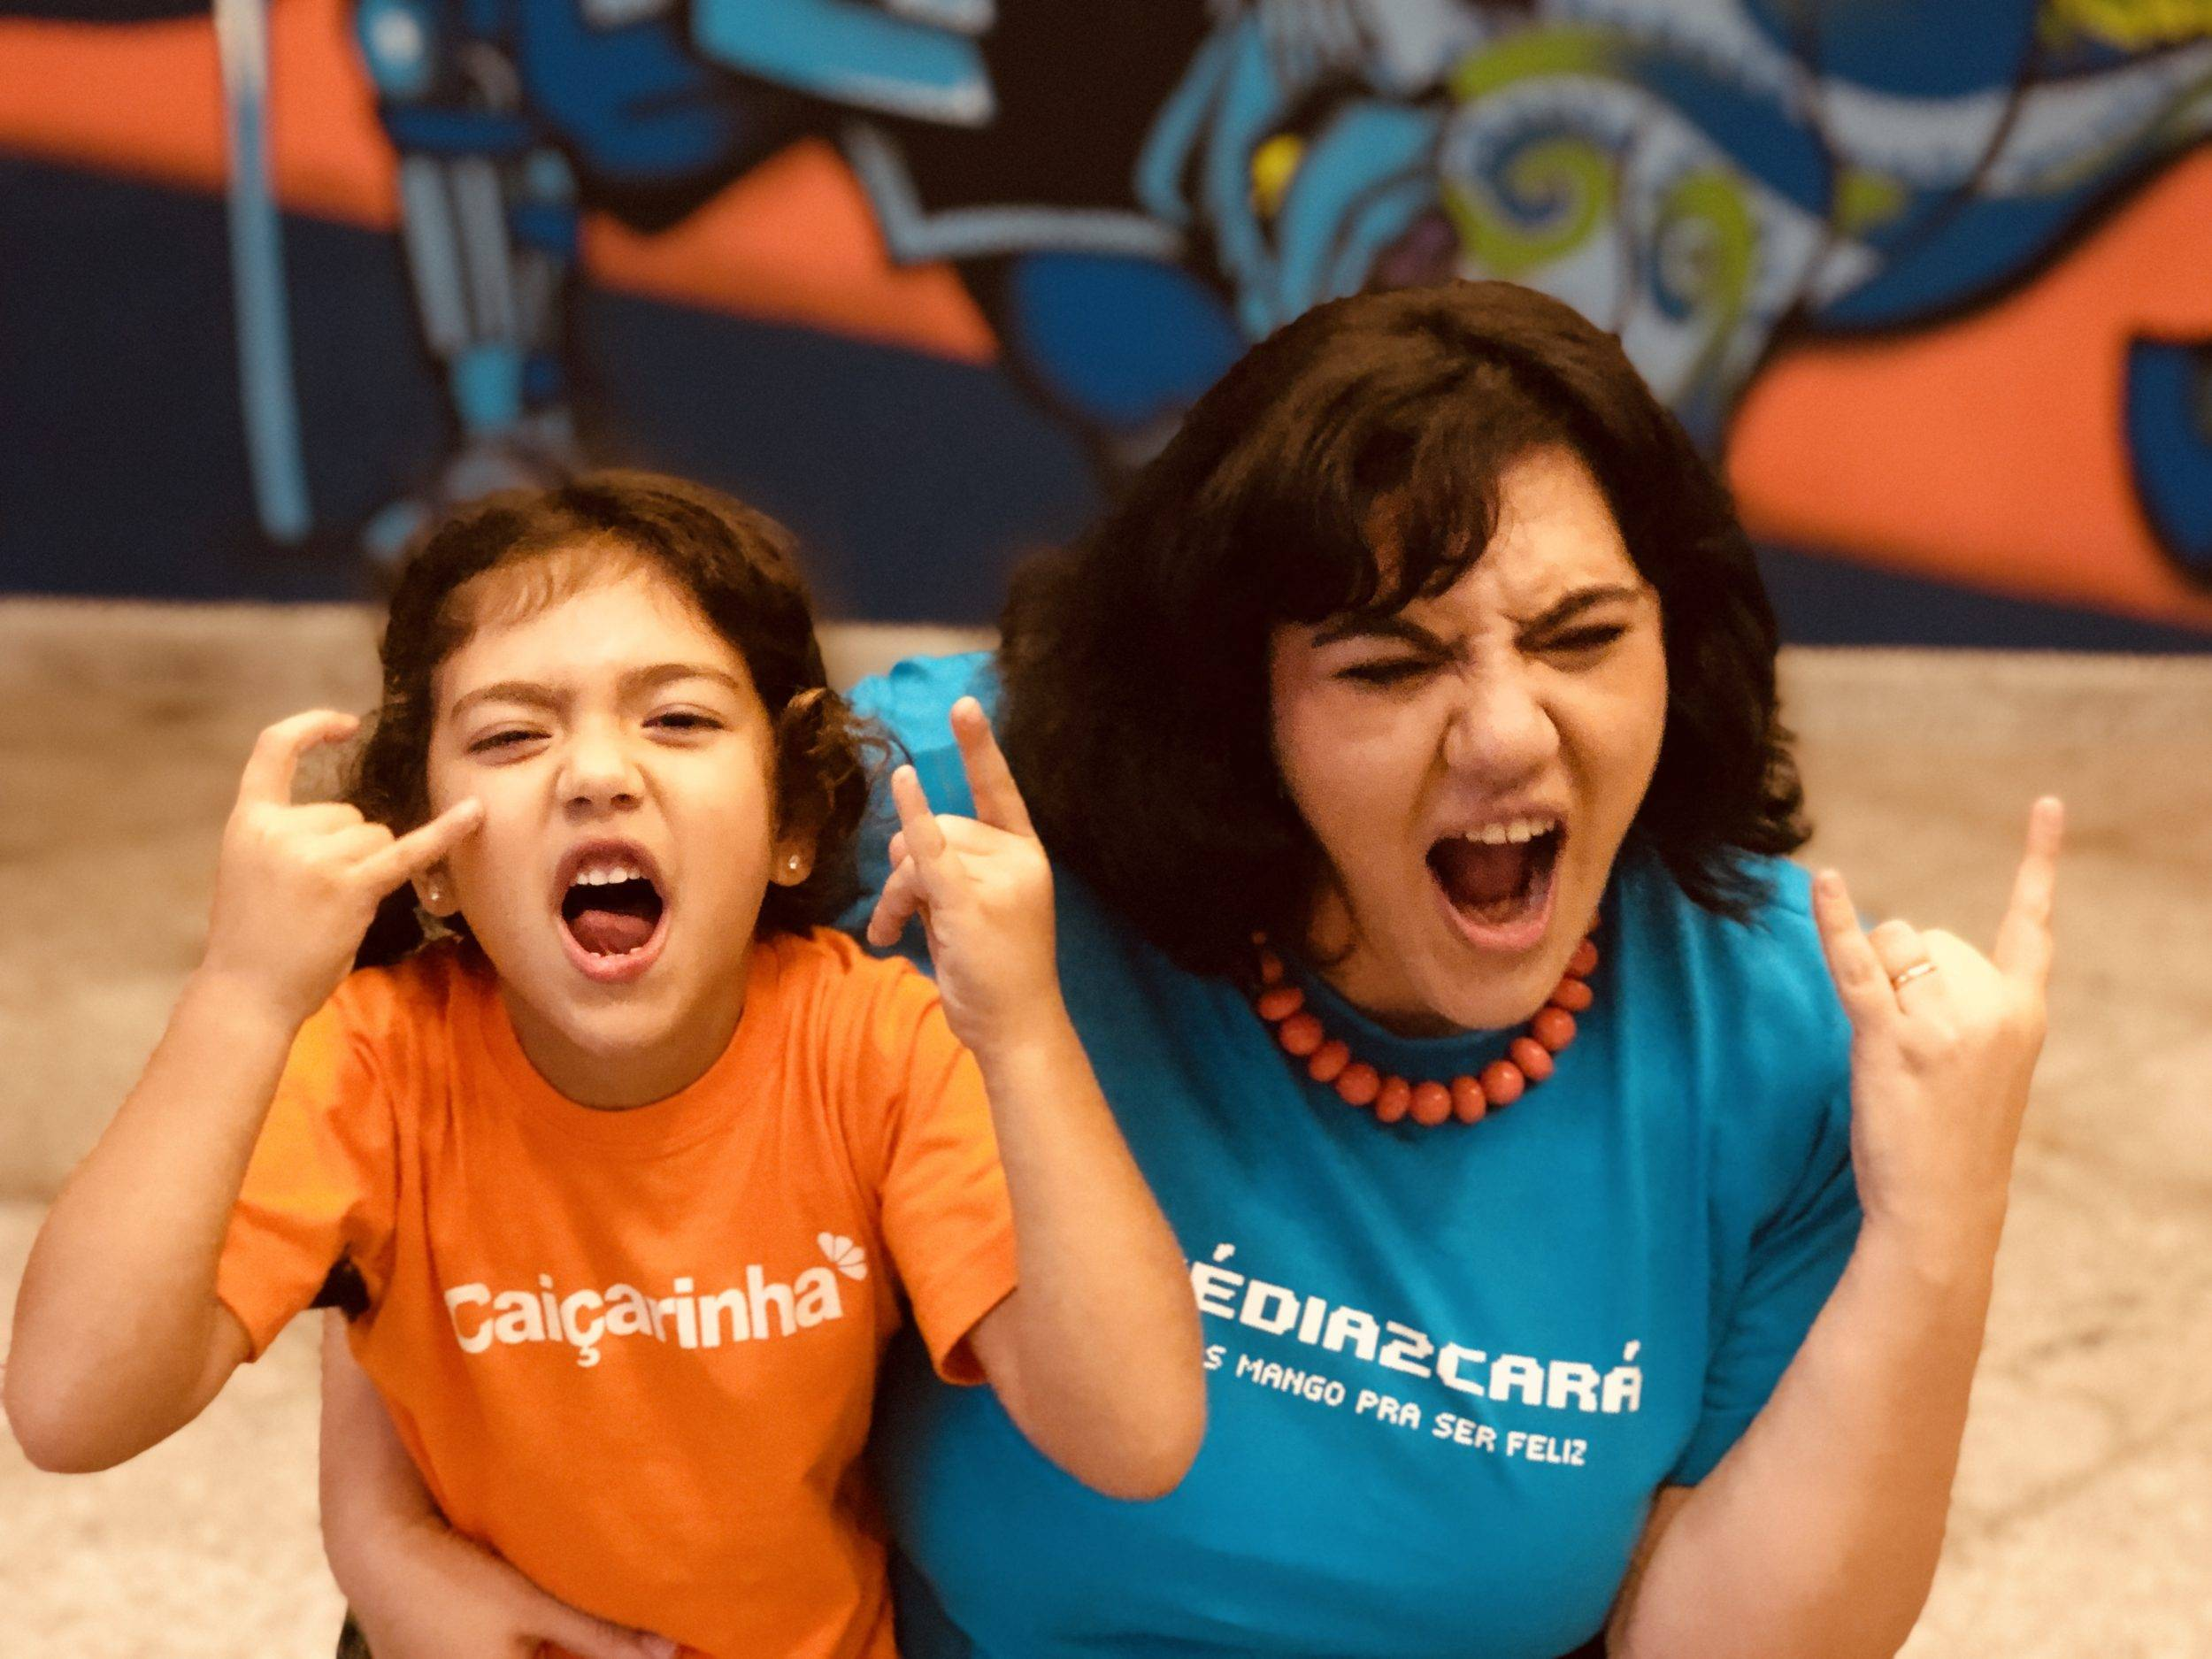 www.juicysantos.com.br - camisetas do juicy santos mãe e filha